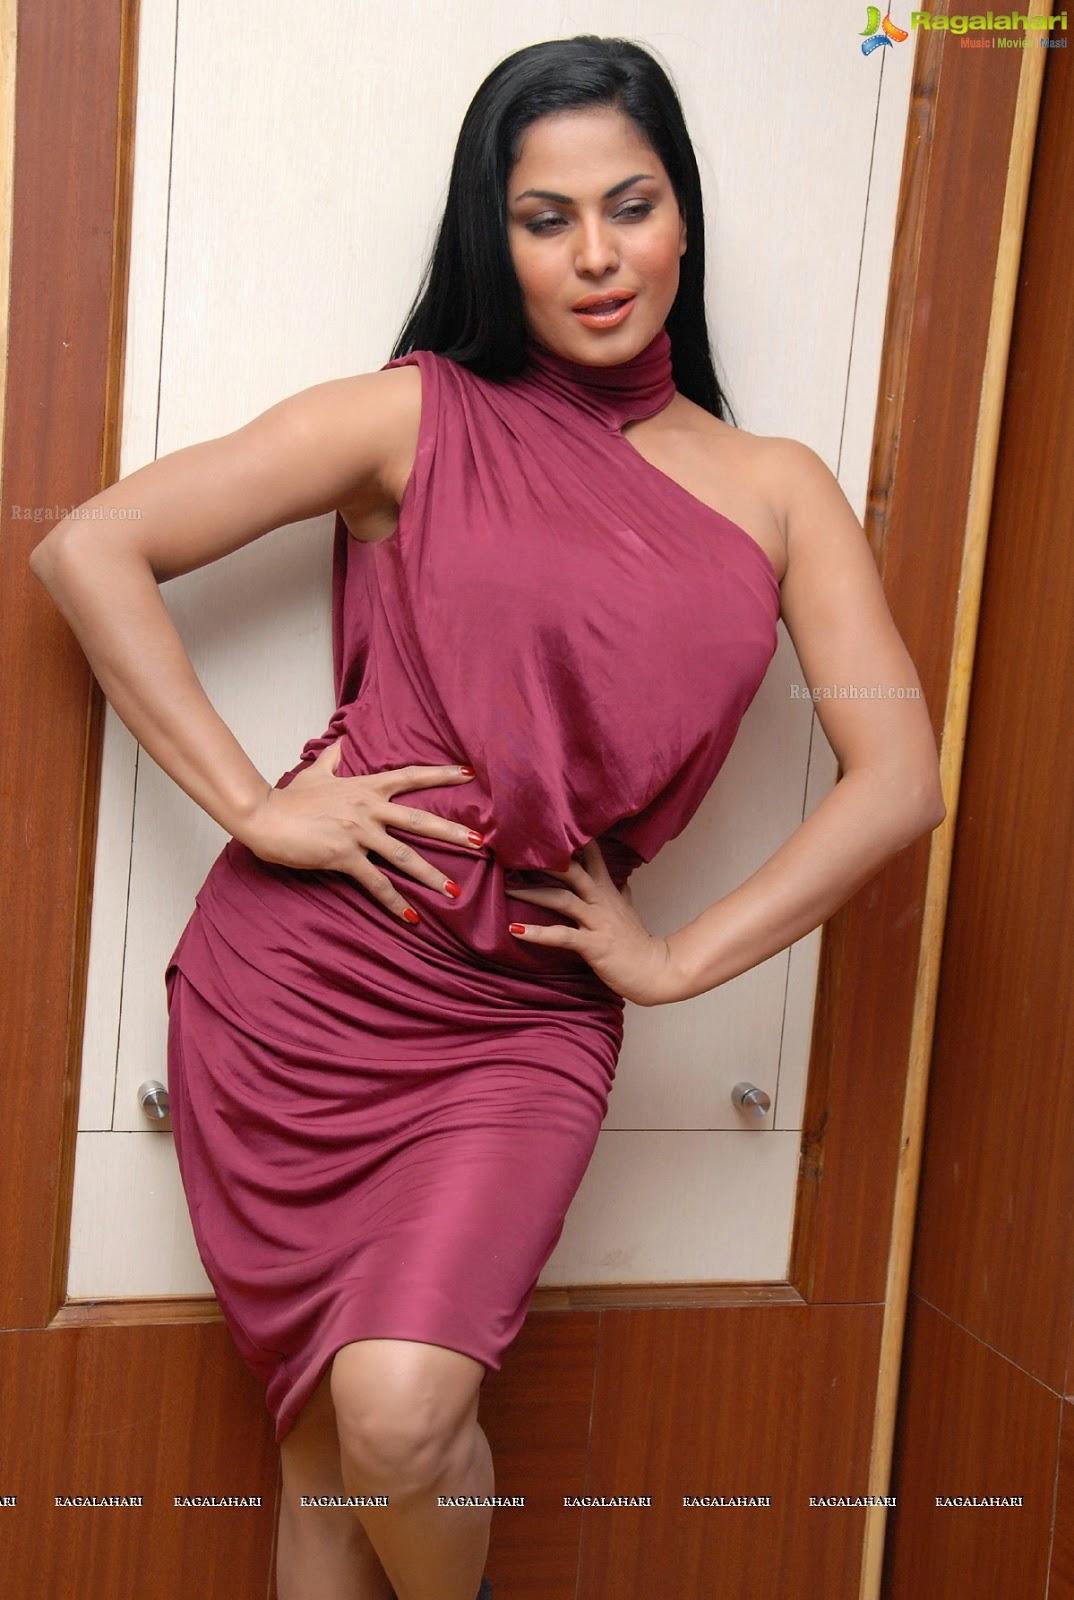 Pakistani Television Captures And Hot Models Veena Malik -4611